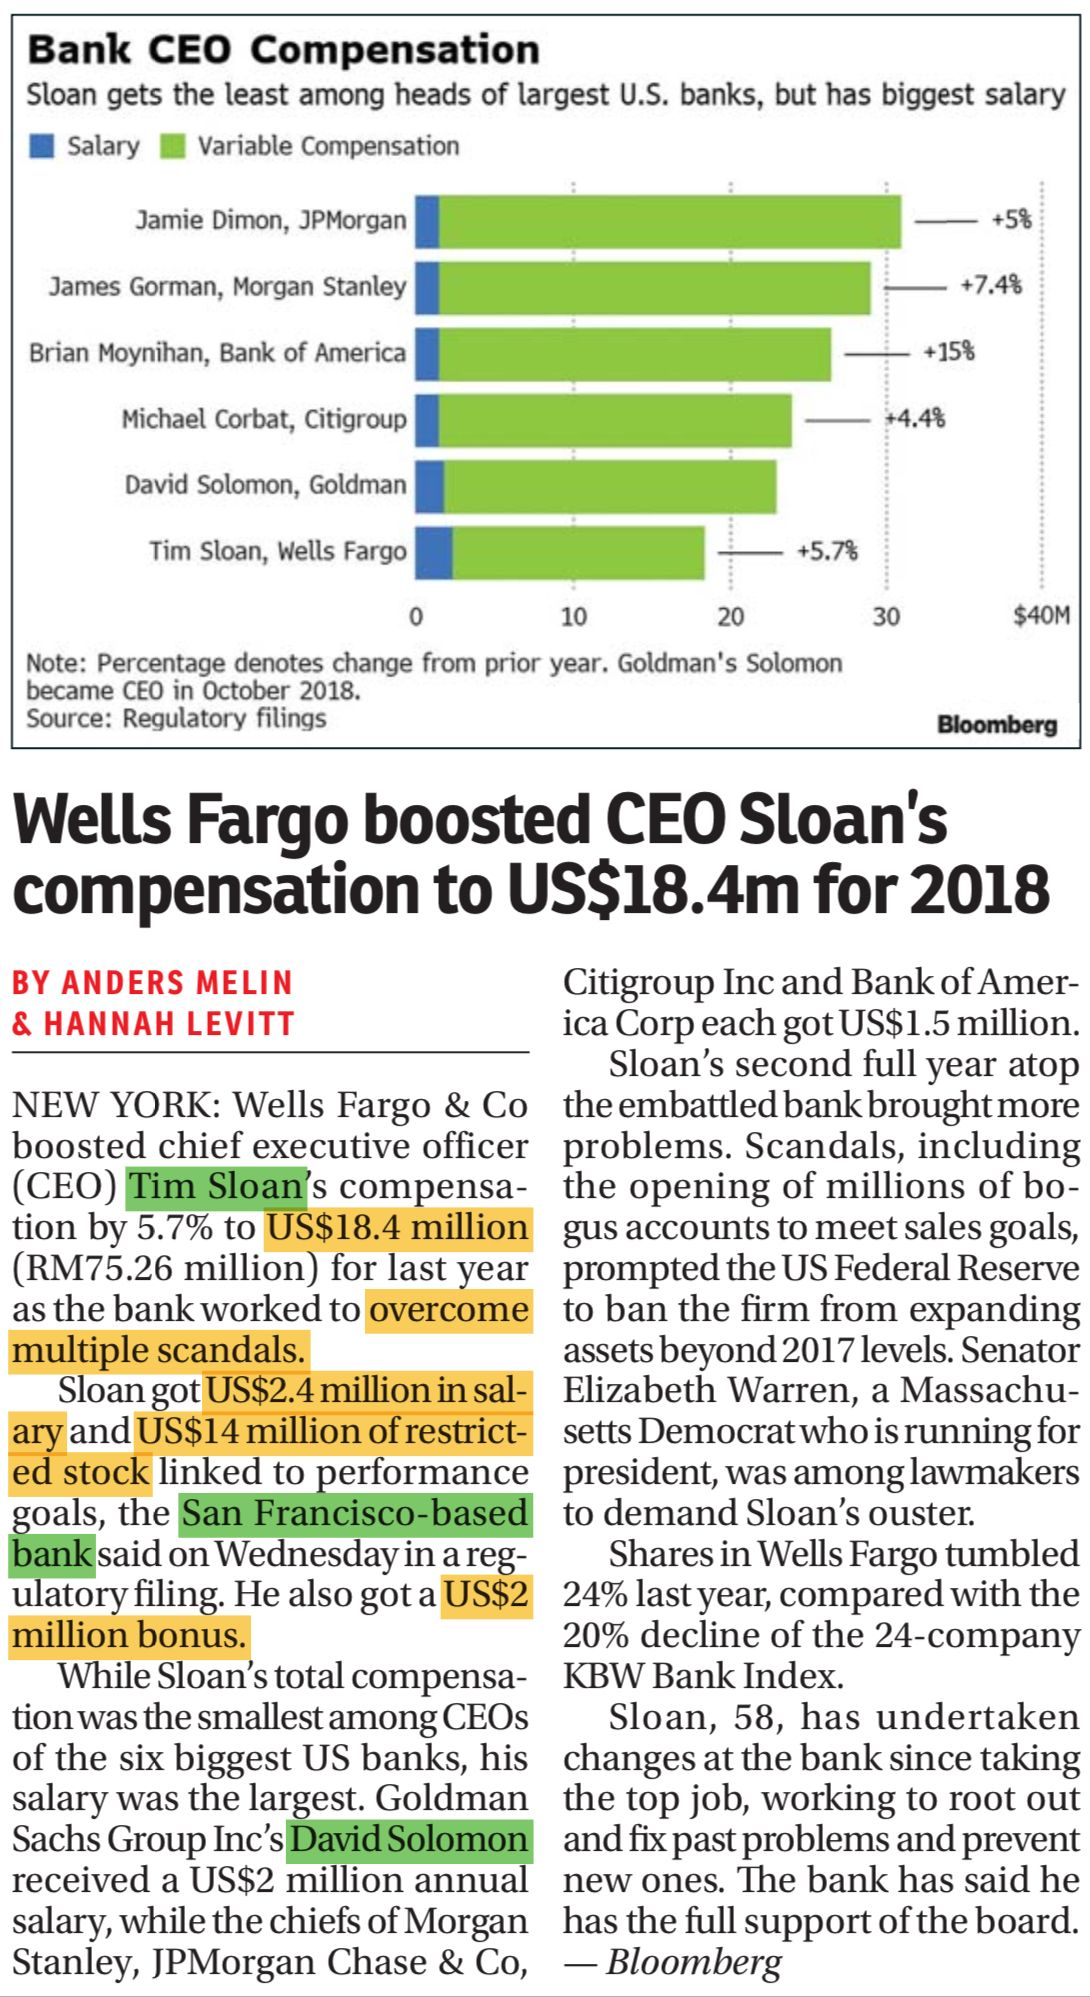 15 Mac 2019 Jamie Dimon James Gorman Bank Of America